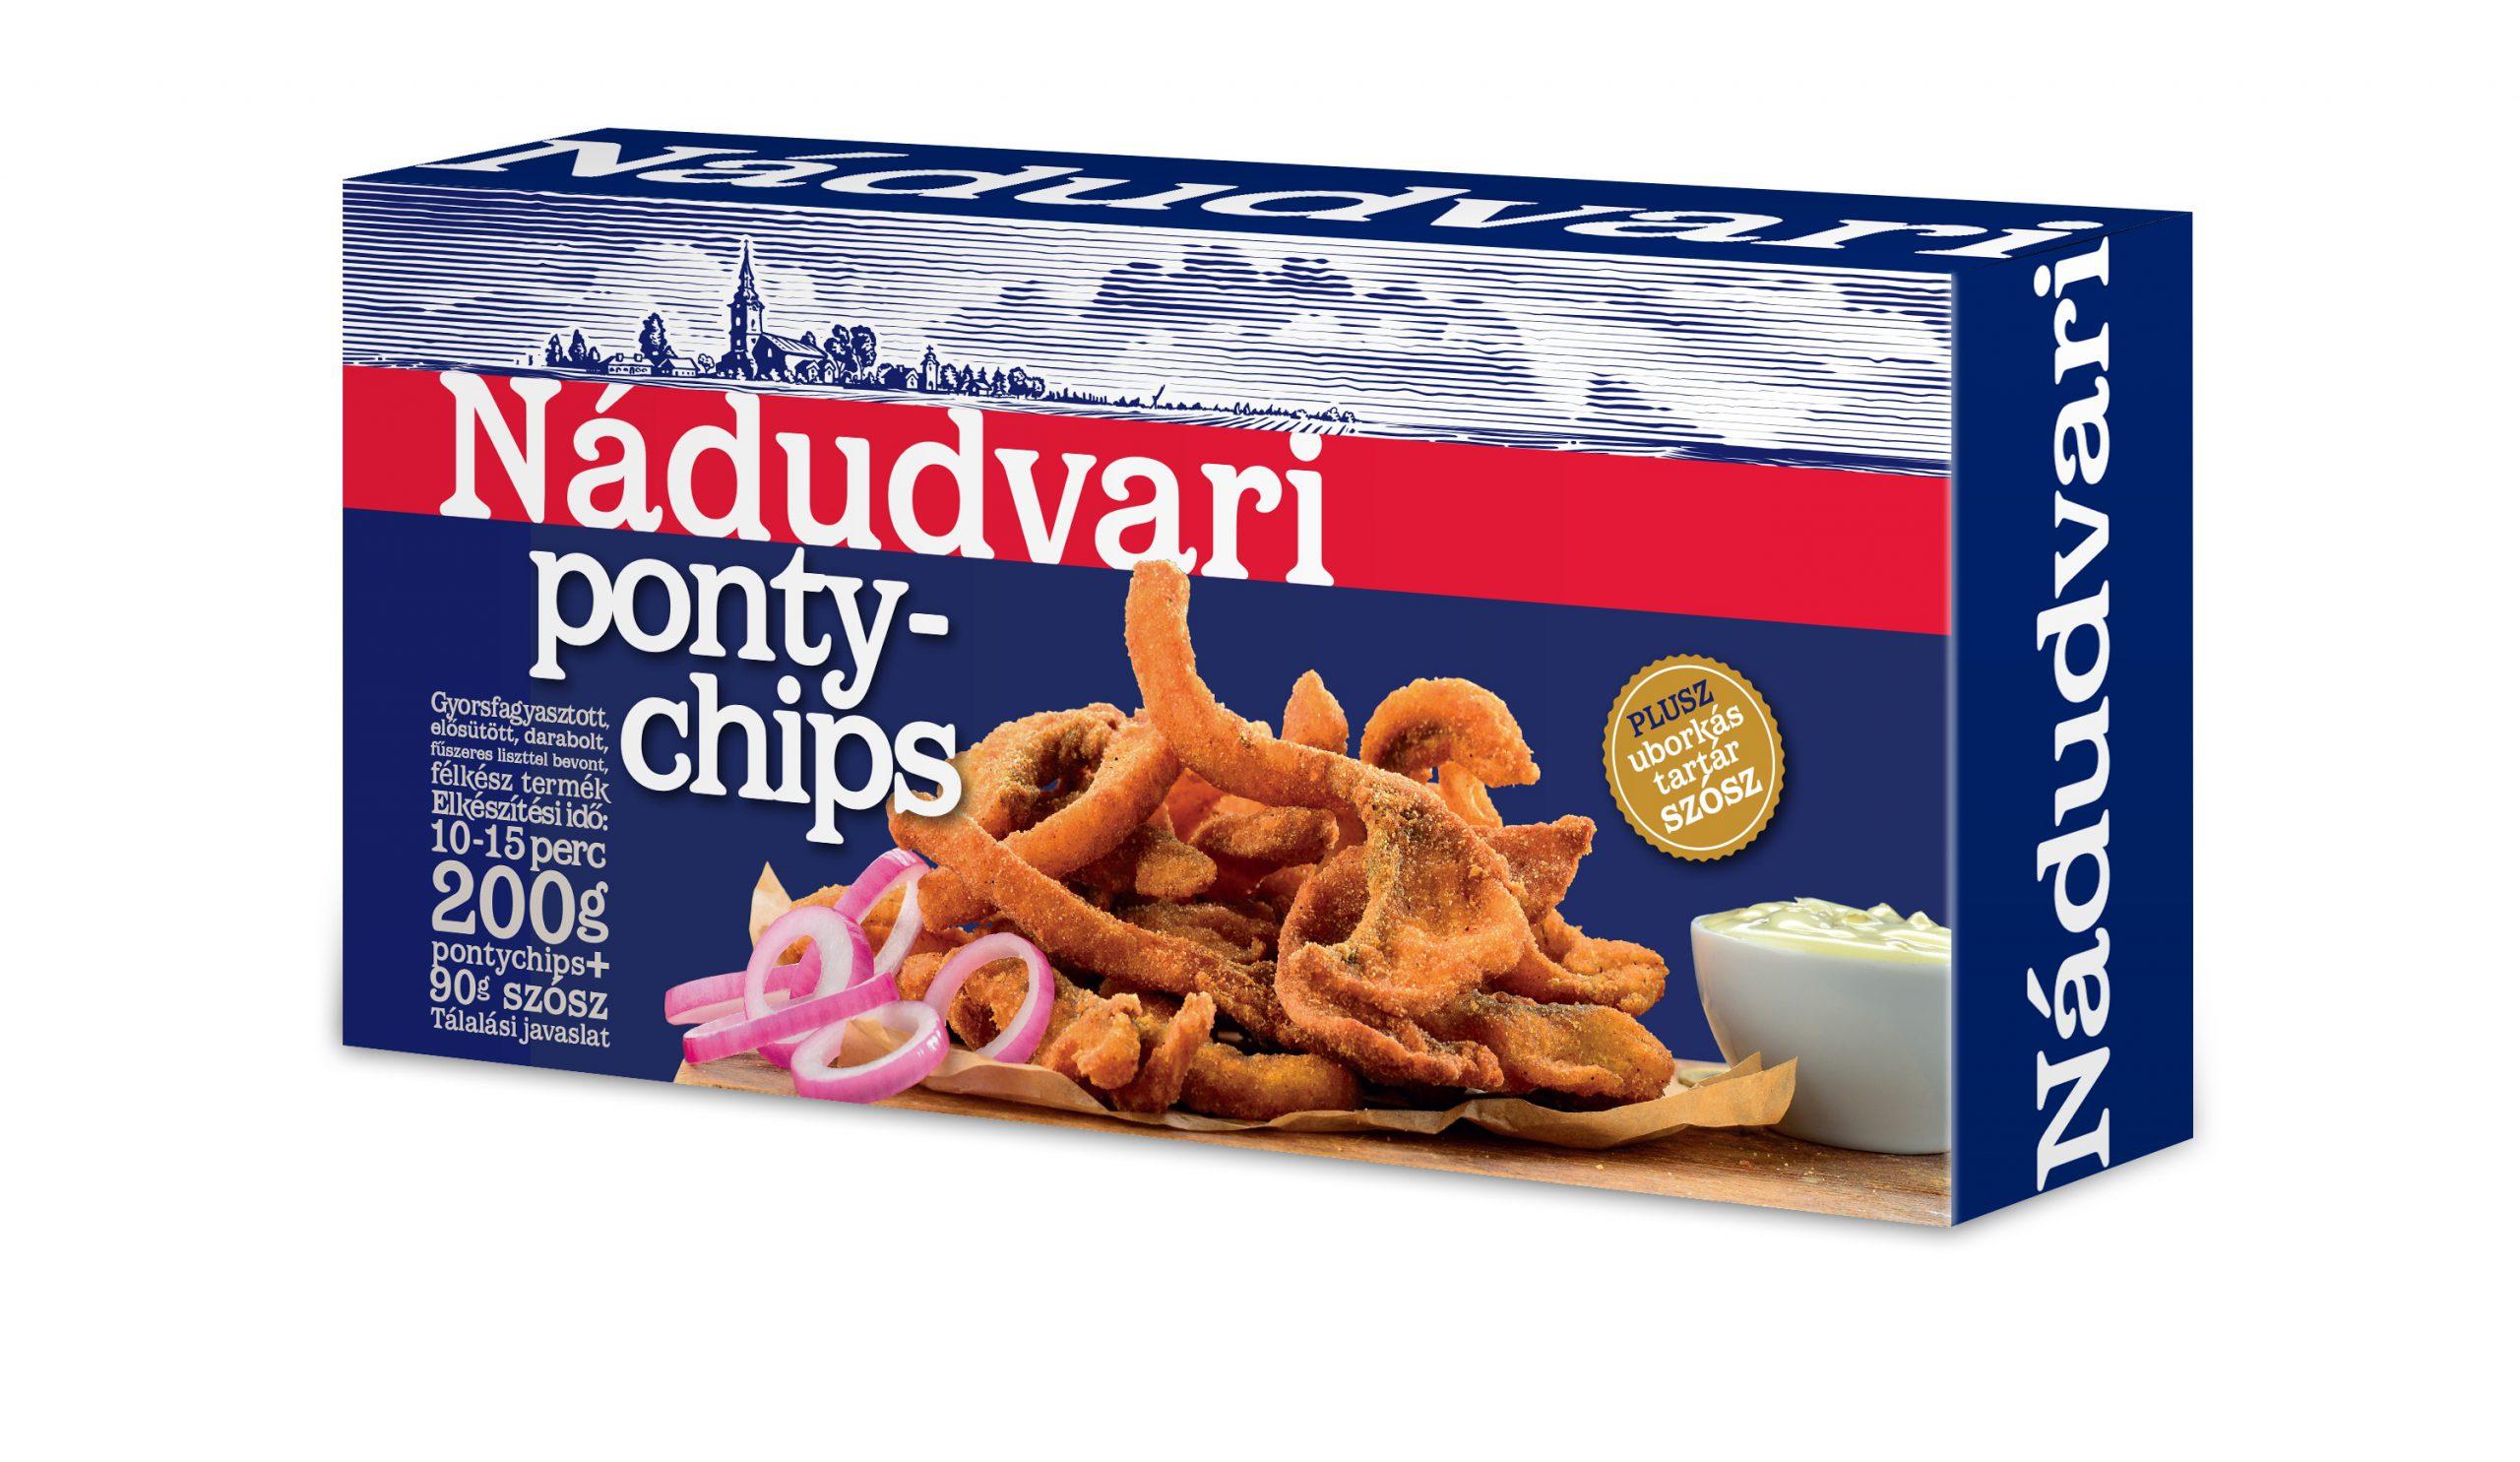 NÁDUDVARI Ponty chips 200g